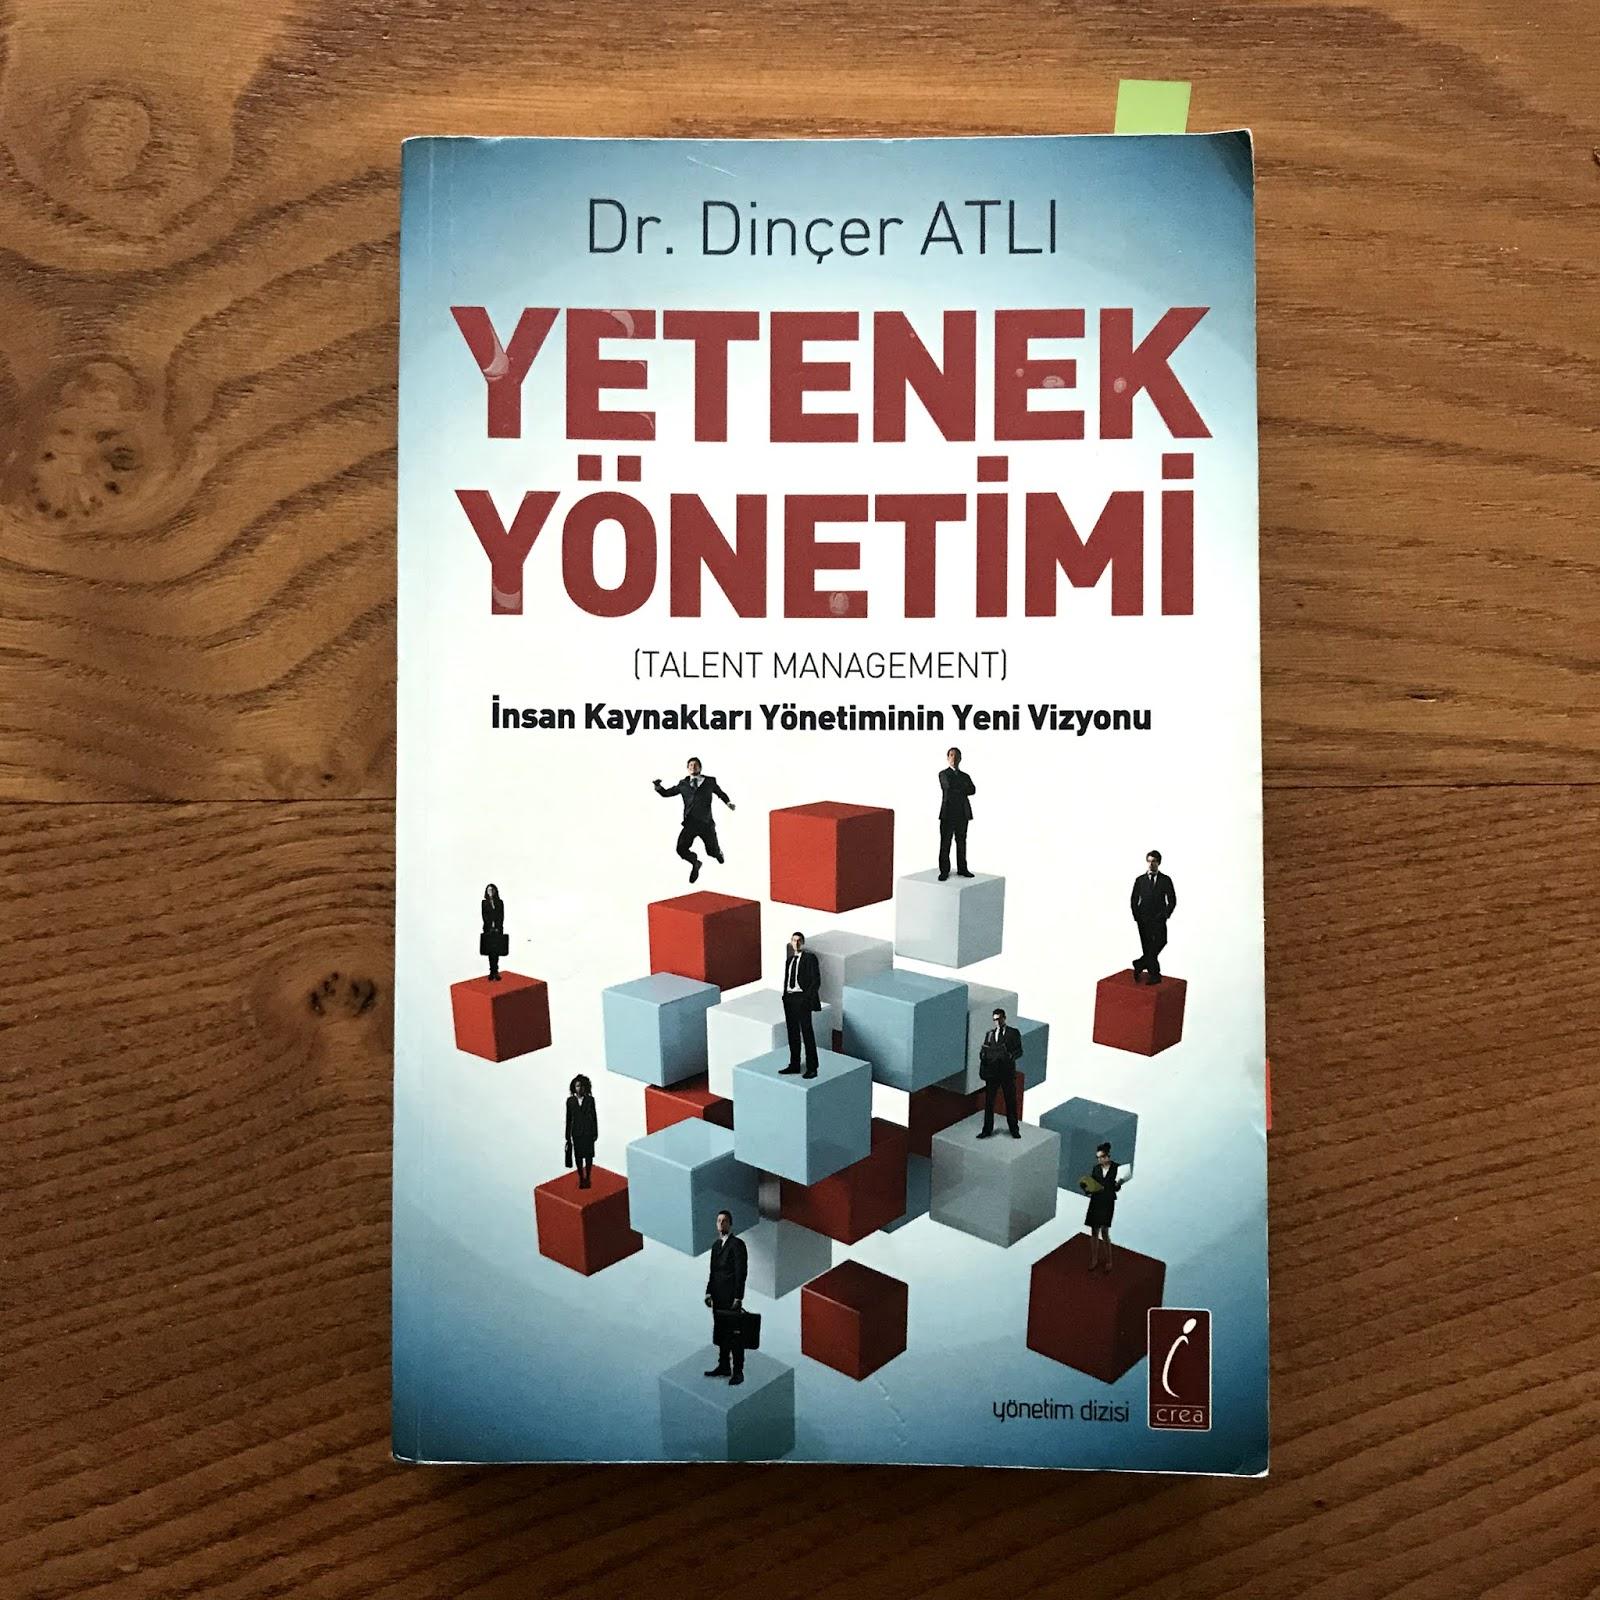 Yetenek Yonetimi - Insan Kaynaklari Yonetiminin Yeni Vizyonu